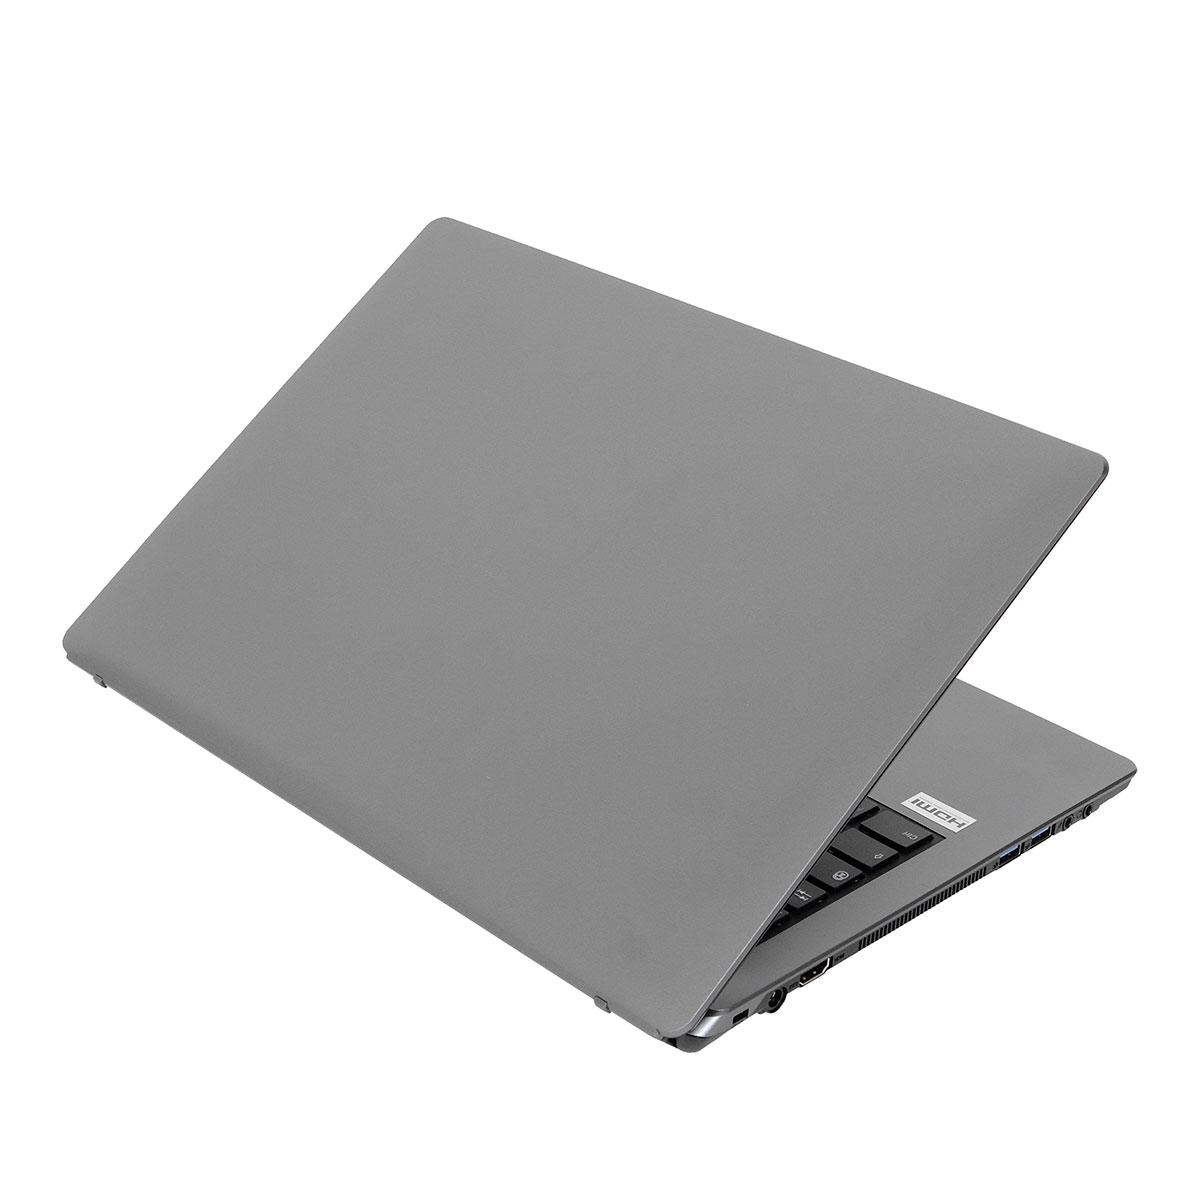 "PC portable LDLC Aurore PC3-2-S1 Intel Celeron N3160 2 Go SSD 120 Go 14"" LED HD Wi-Fi N/Bluetooth Webcam (sans OS)"